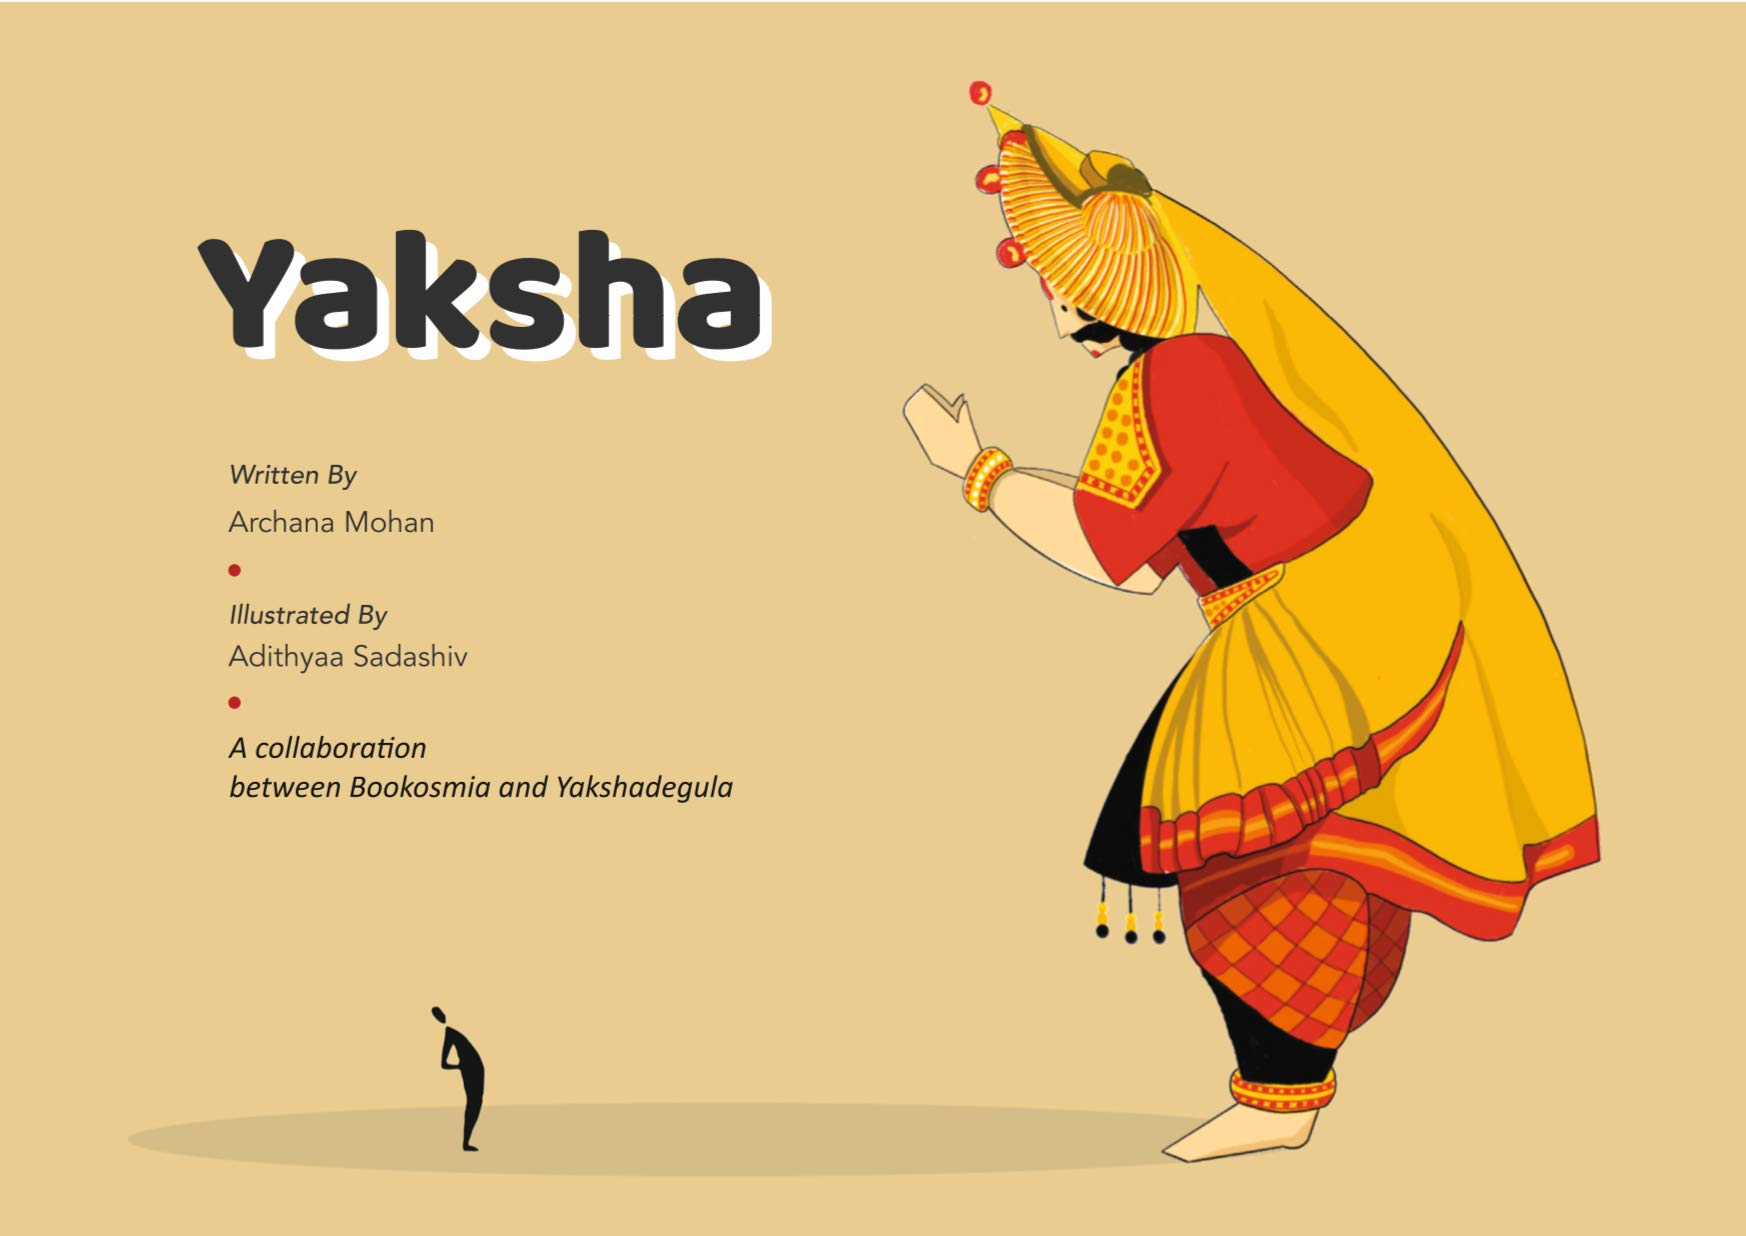 Bookosmia - Yaksha